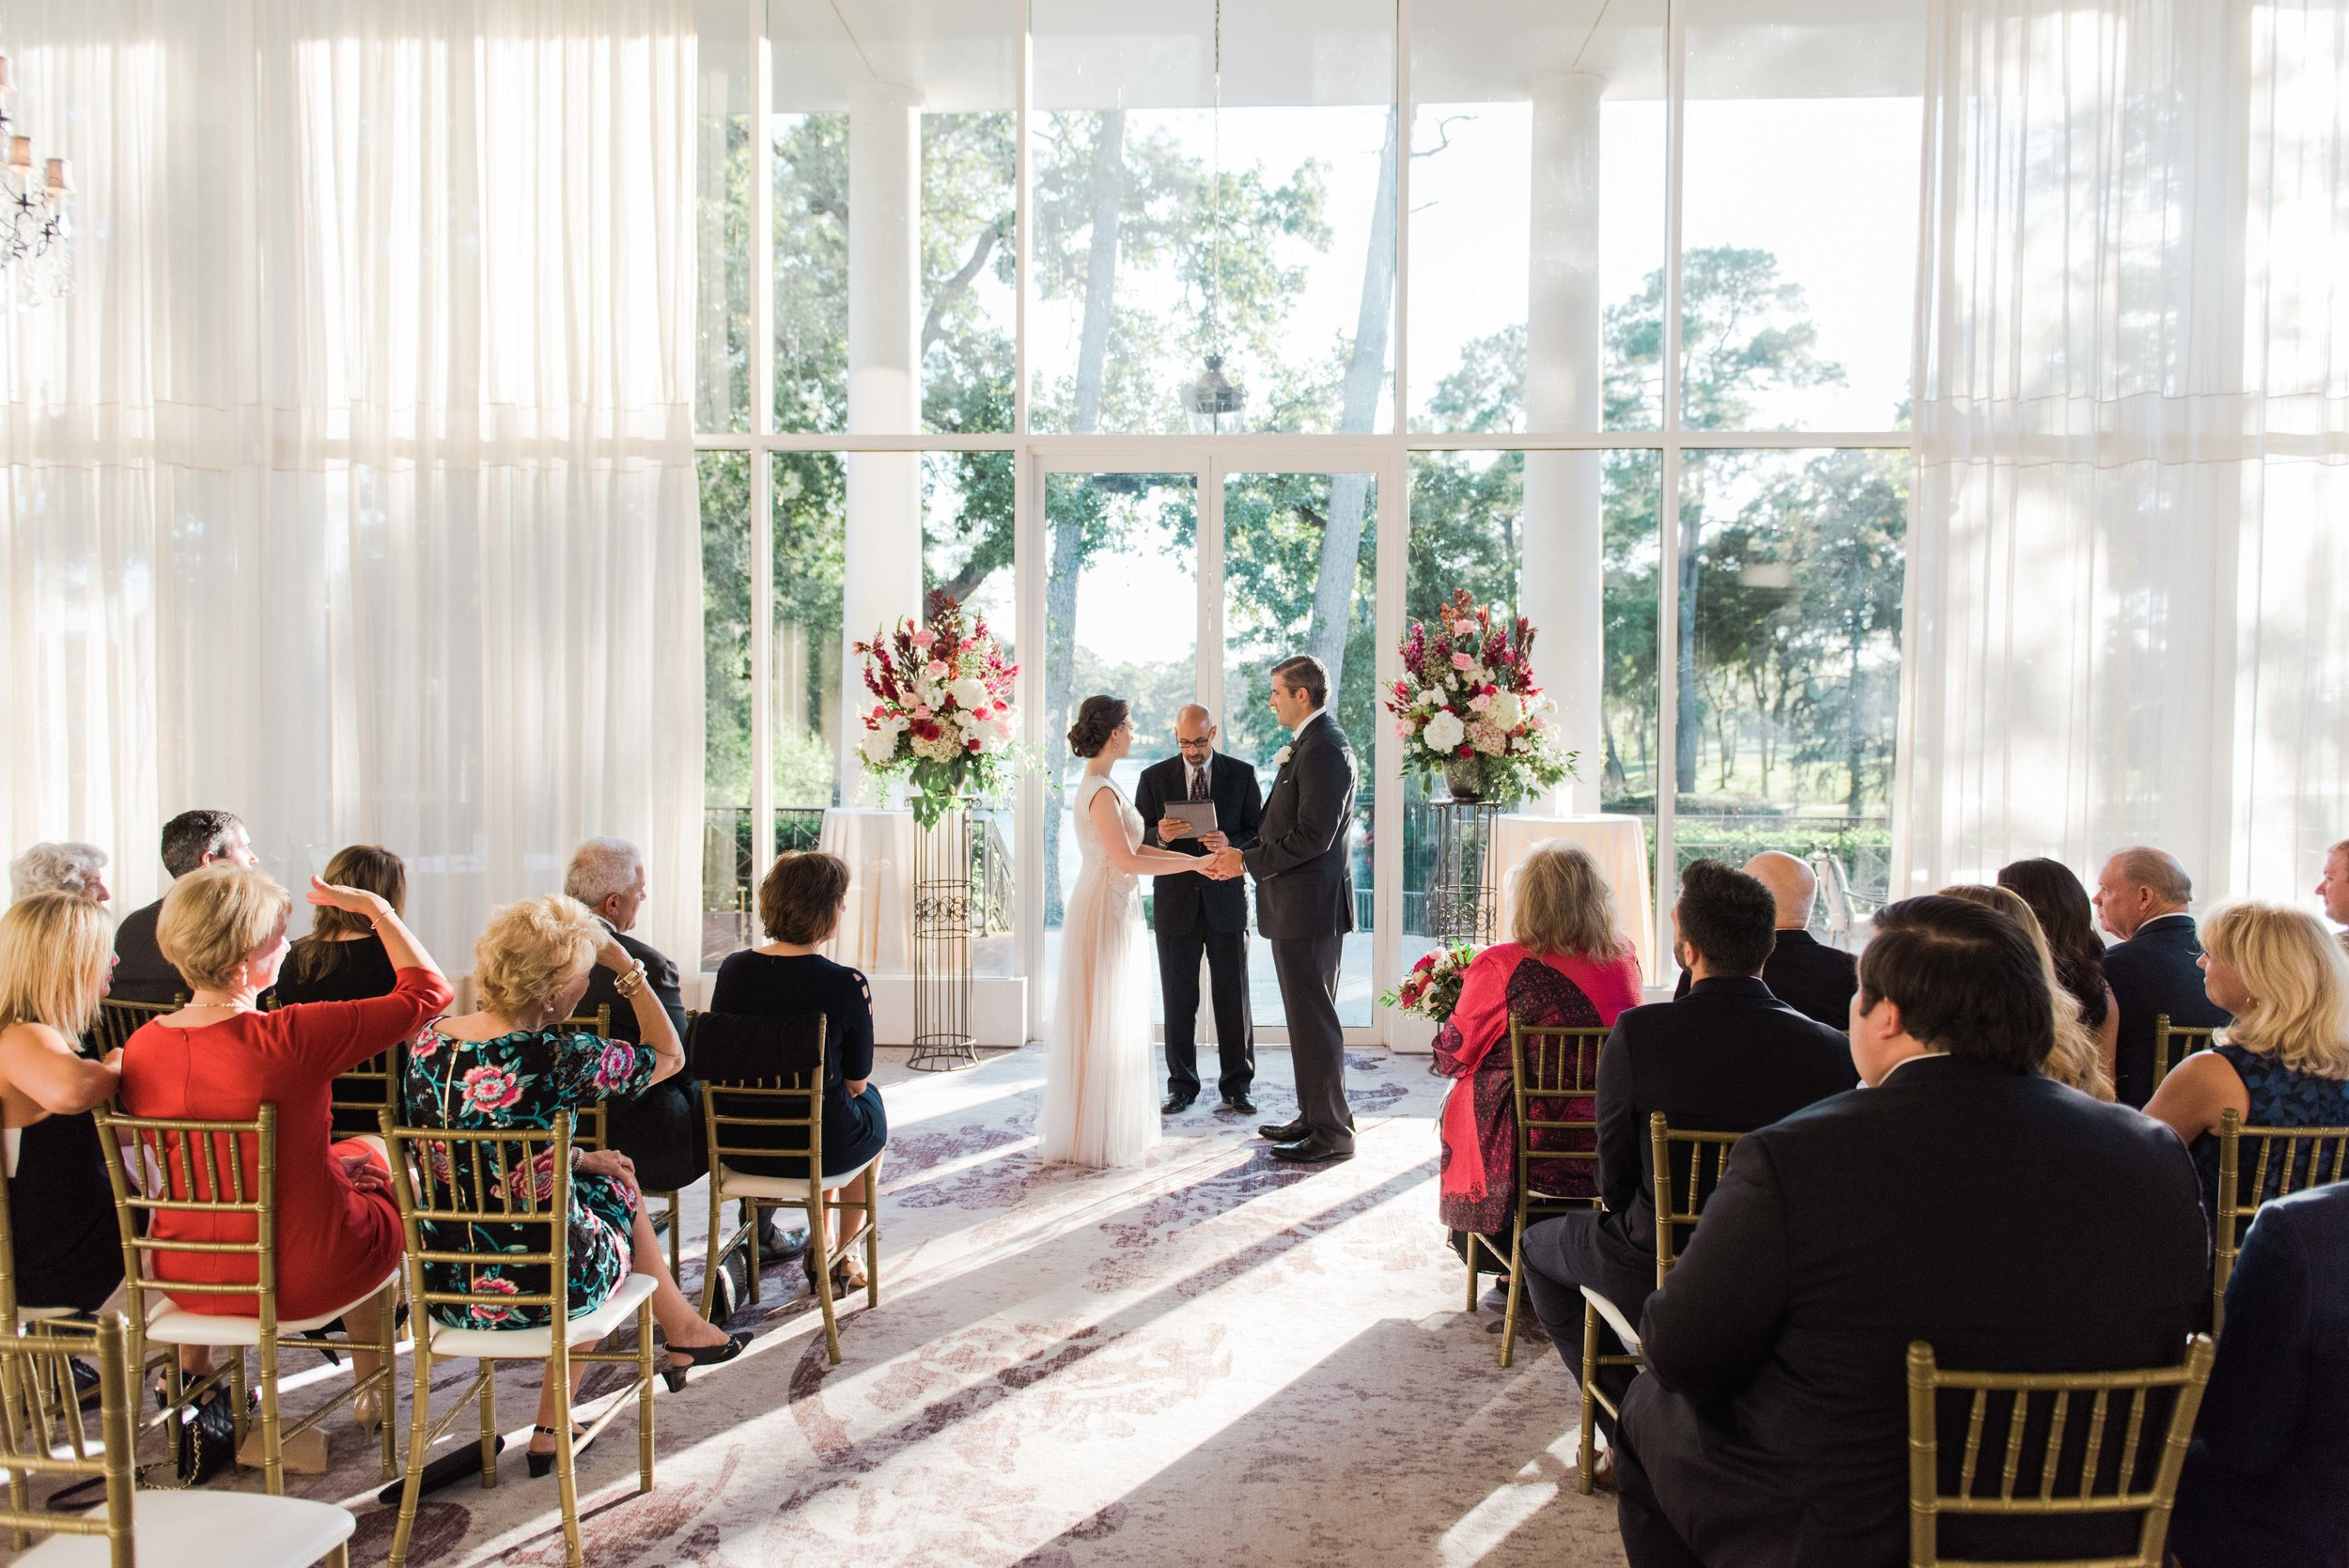 Houston-Wedding-Photographer-Lakeside-Country-Club-First-Look-Bride-Groom-Formals-Film-Fine-Art-Photography-30.jpg